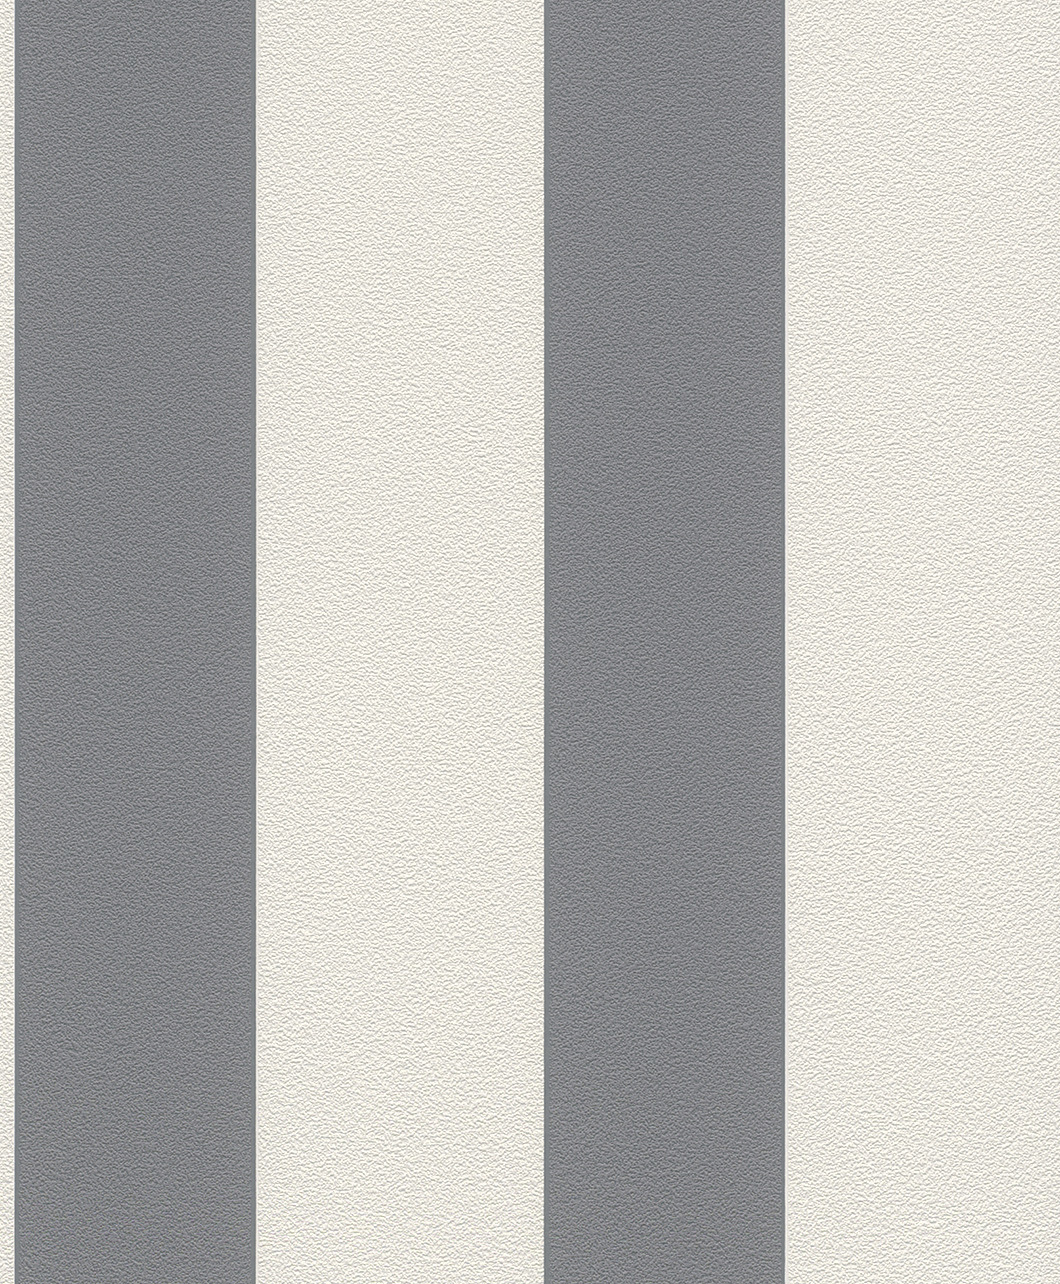 vliestapete rasch prego 700237 waagerecht streifen gestreift wei grau ebay. Black Bedroom Furniture Sets. Home Design Ideas